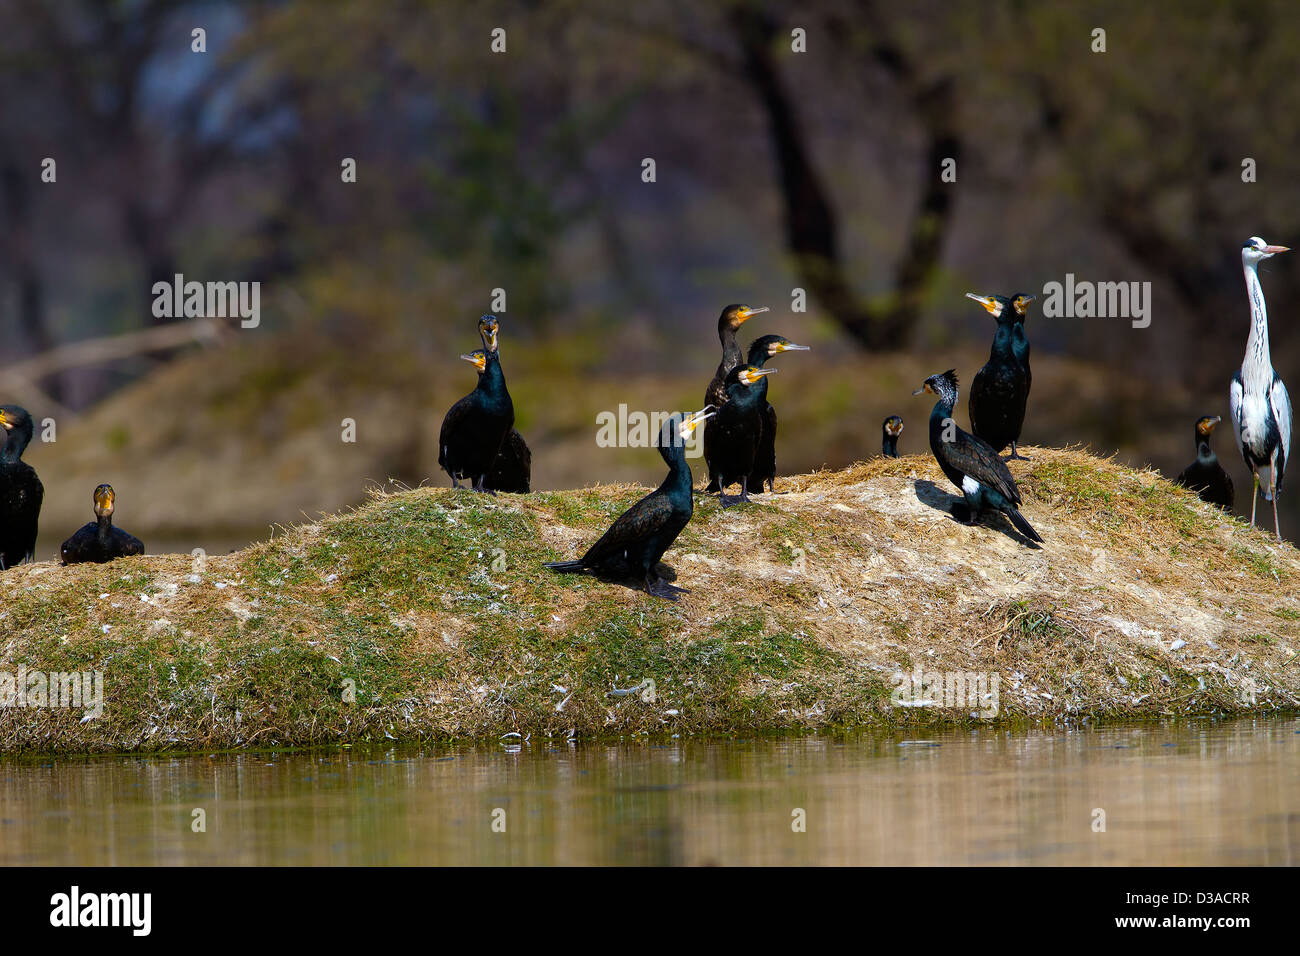 Cormorant Wing Freshwater Bird wild birds Animals And Pets